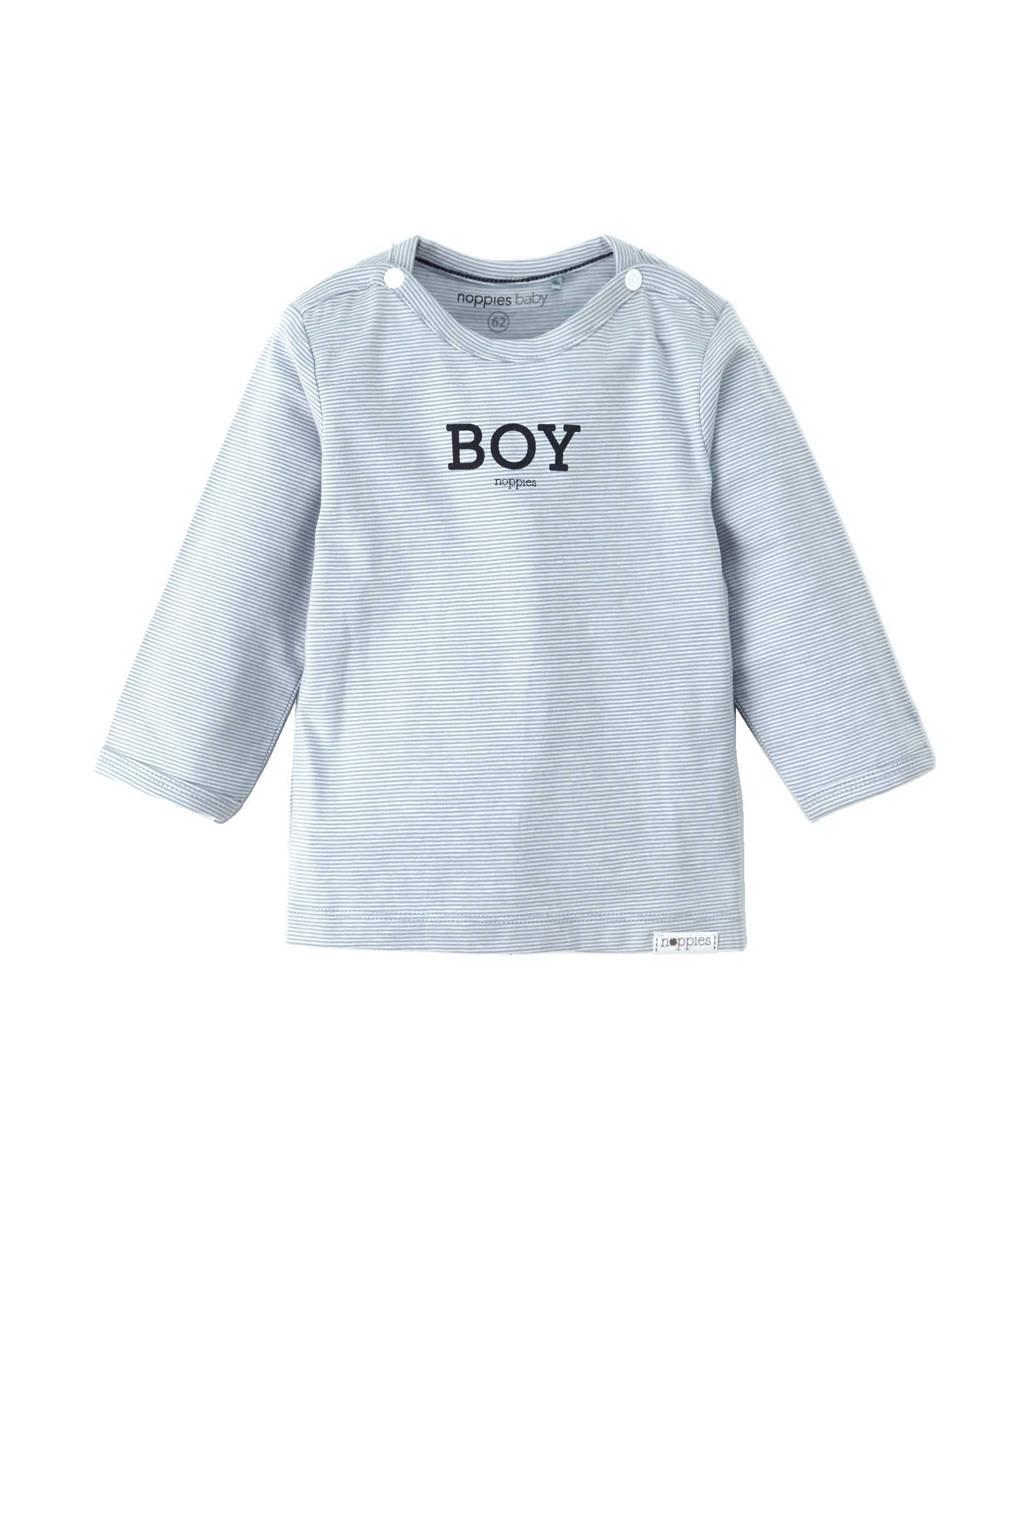 Noppies newborn baby longsleeve Grey blue, Blauw